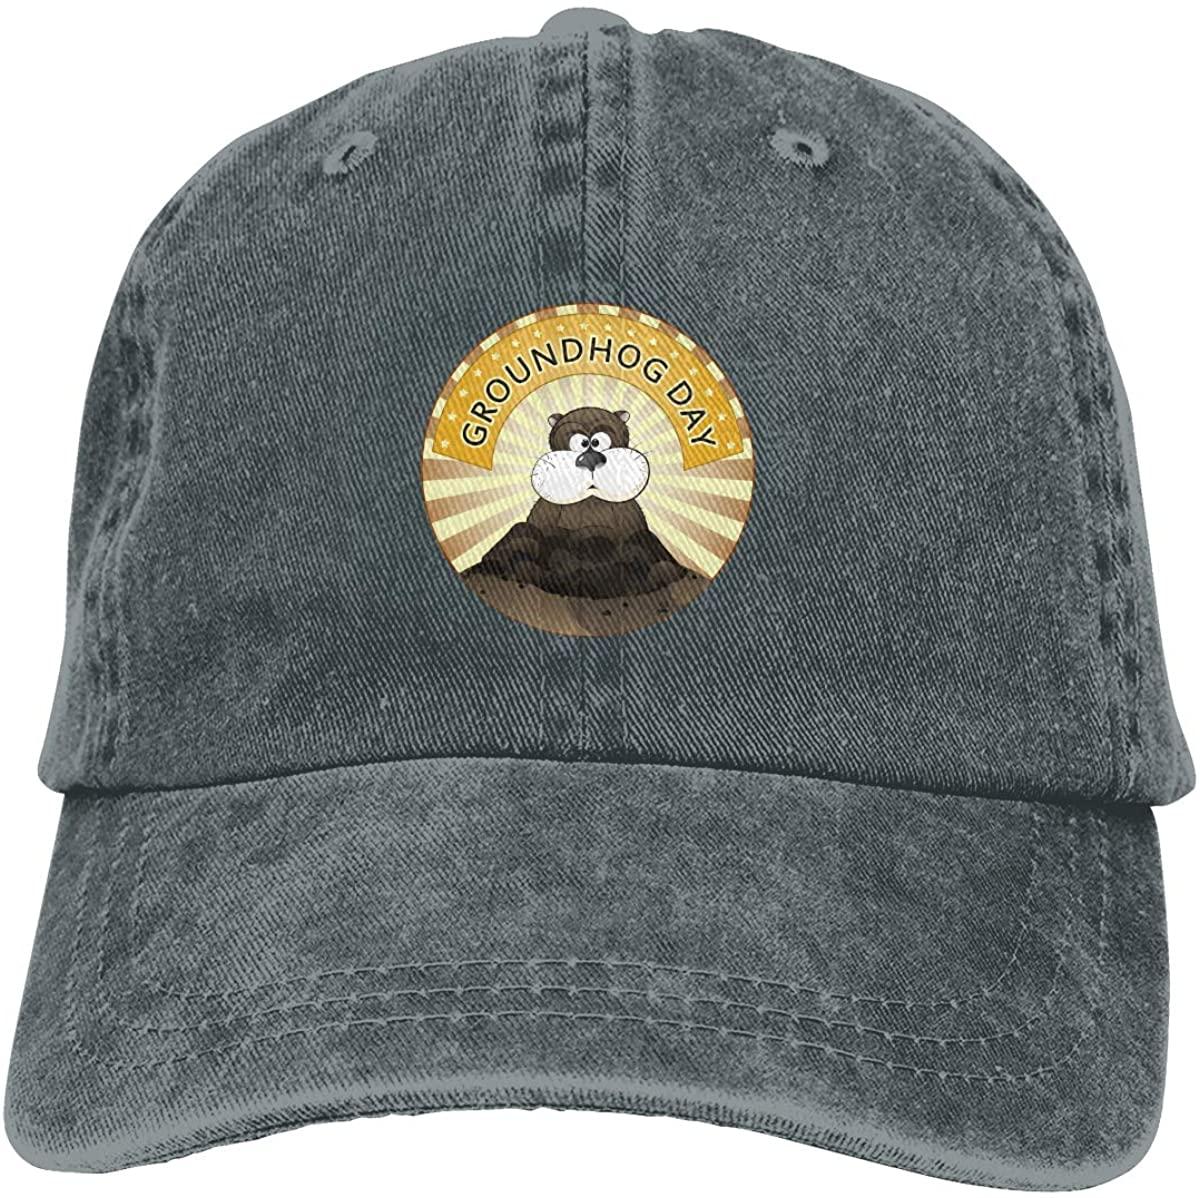 Tailing Groundhog Day Unisex Adjustable Cowboy Hat Baseball Cap for Sport